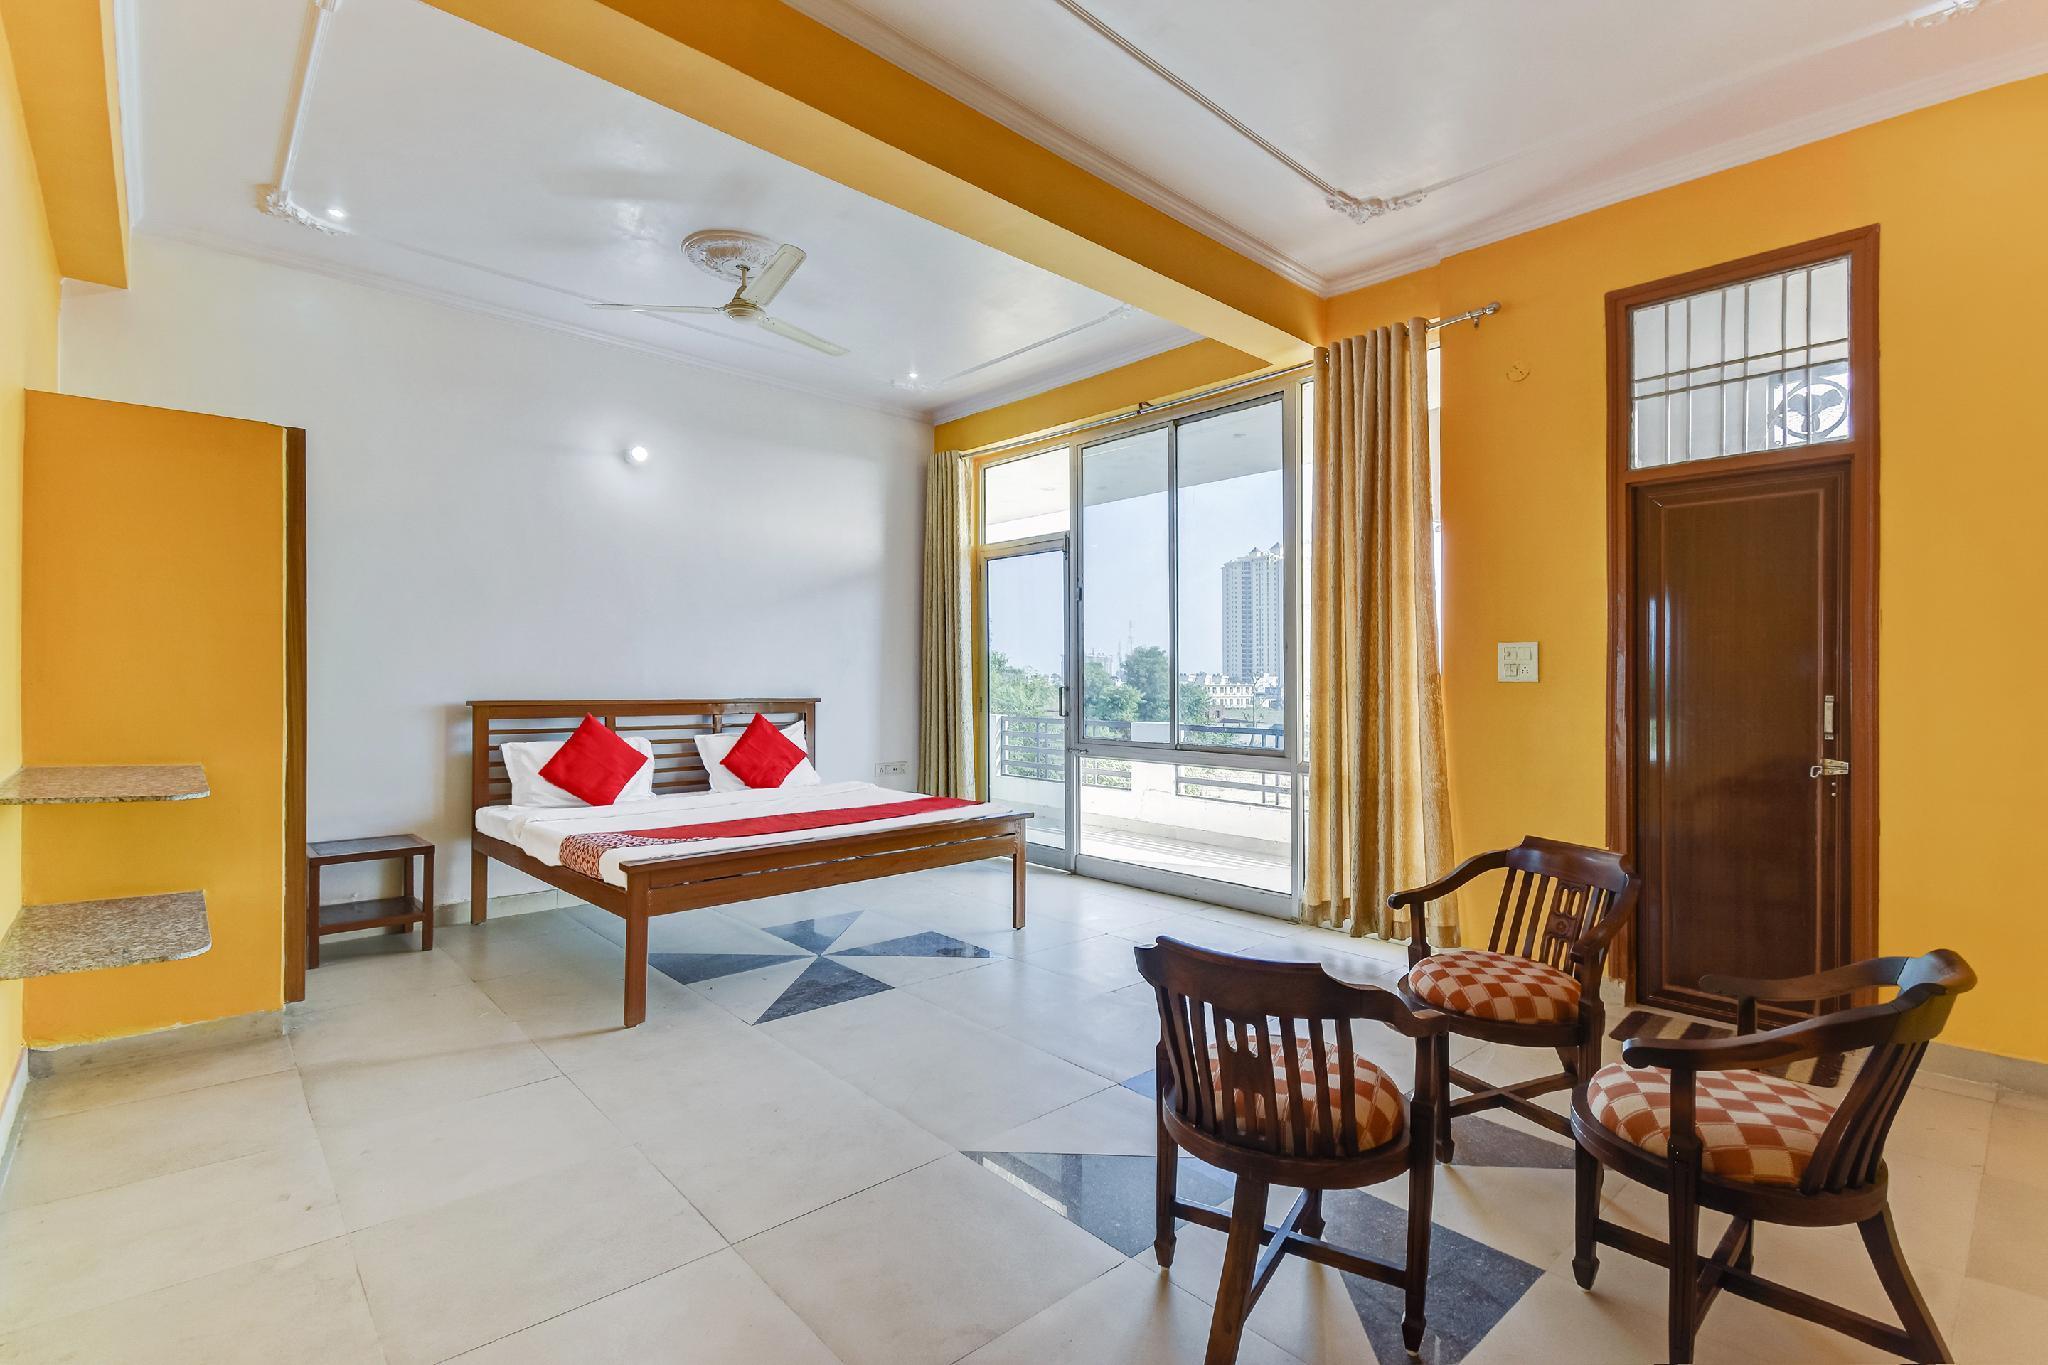 OYO 64464 Hotel Gulmohar